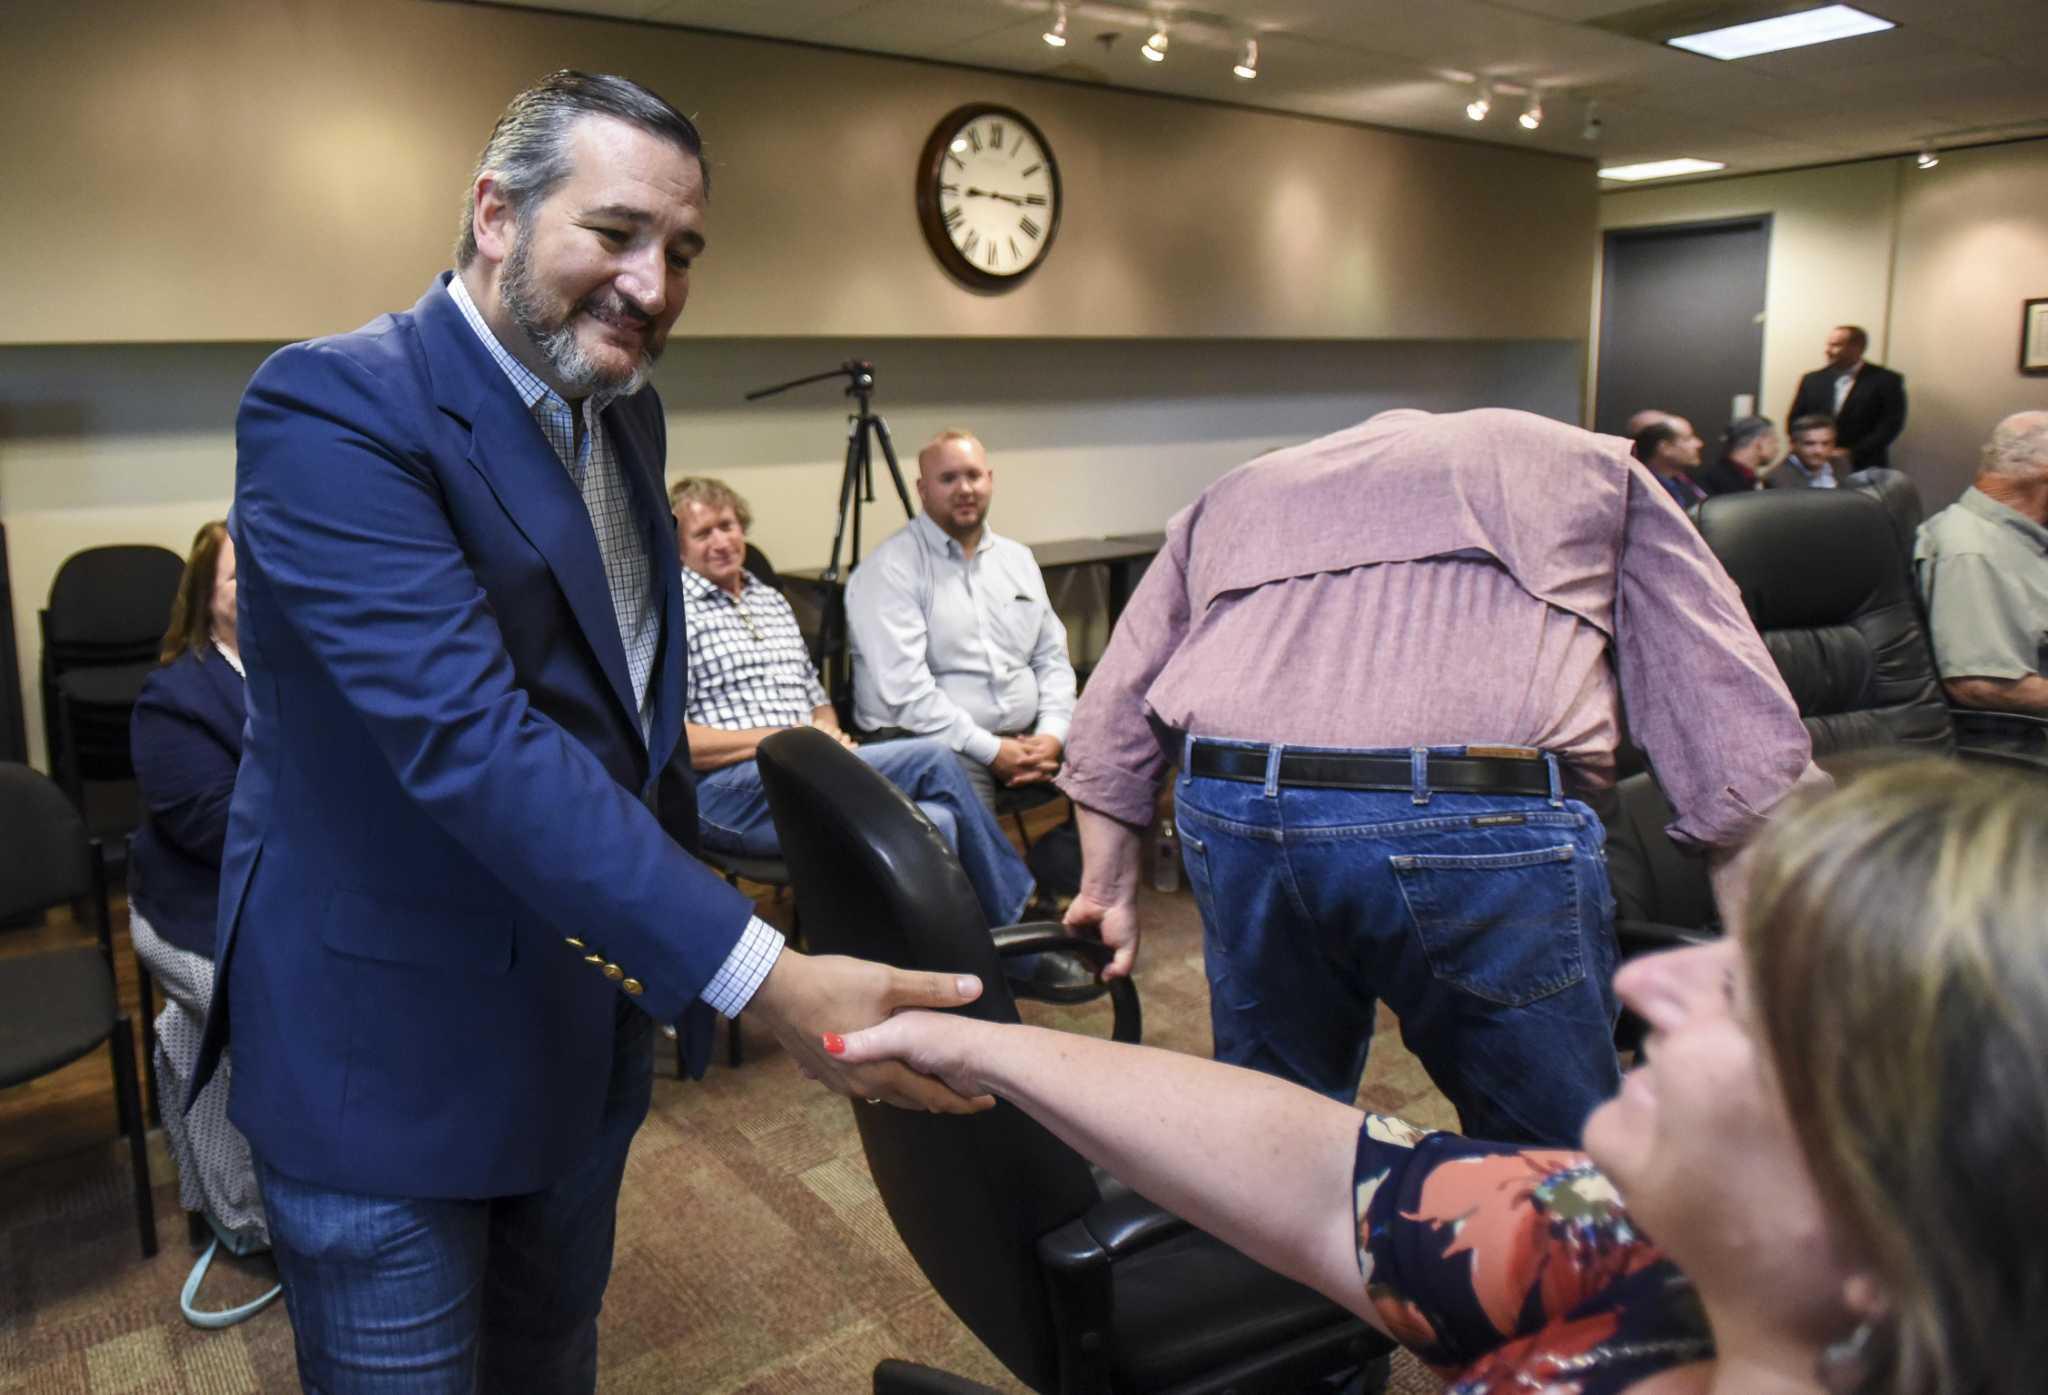 Cruz, other oil senators set to meet with Trump on ethanol